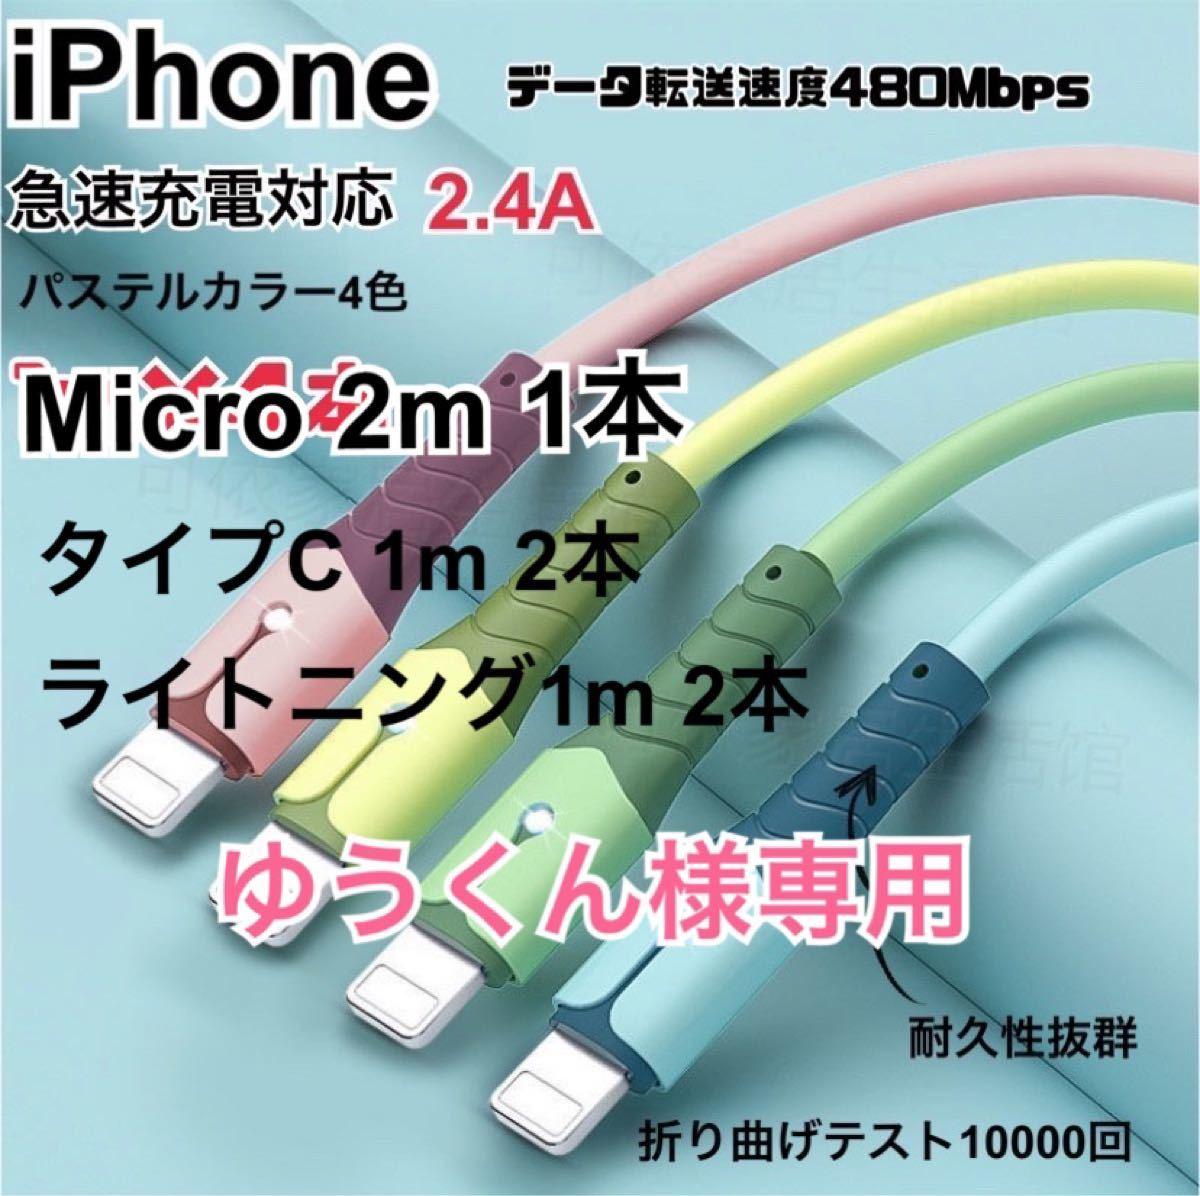 type-c 充電ケーブル 急速充電USB3.0A 1m 4本セット